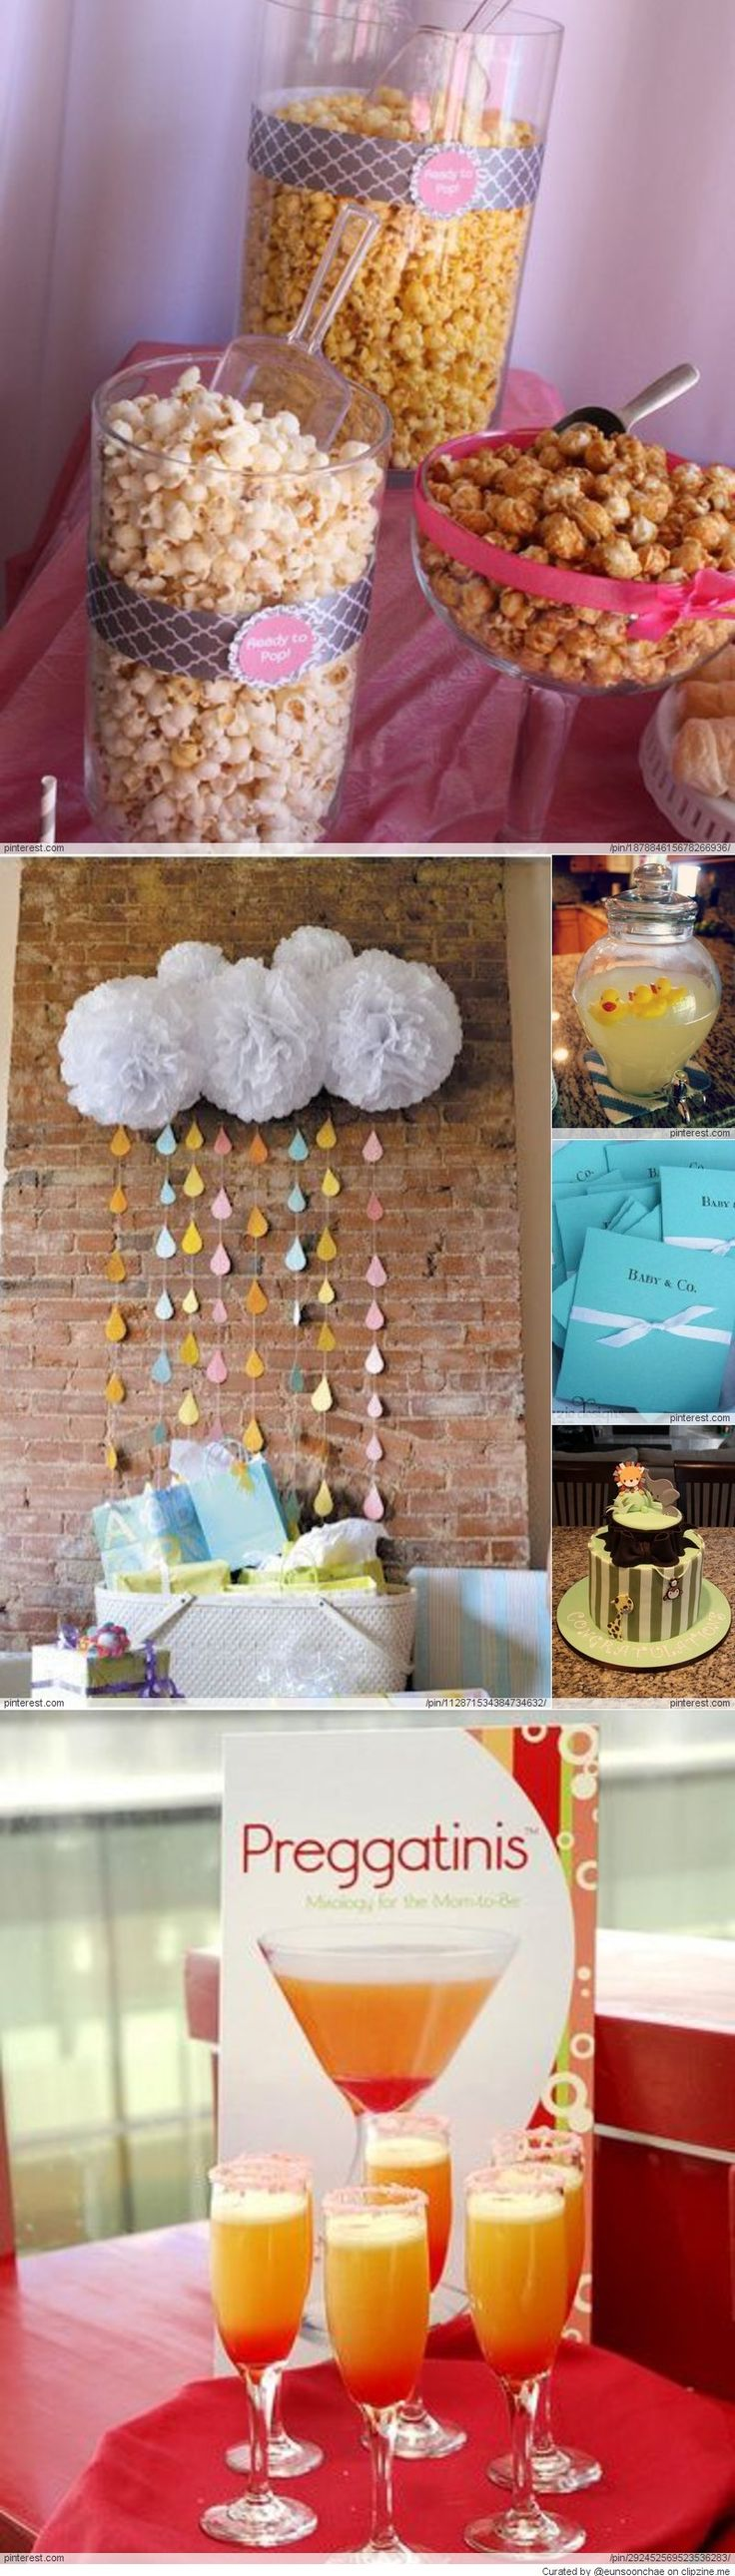 Baby Shower Decorations  Themes.  Love the Preggatini idea!